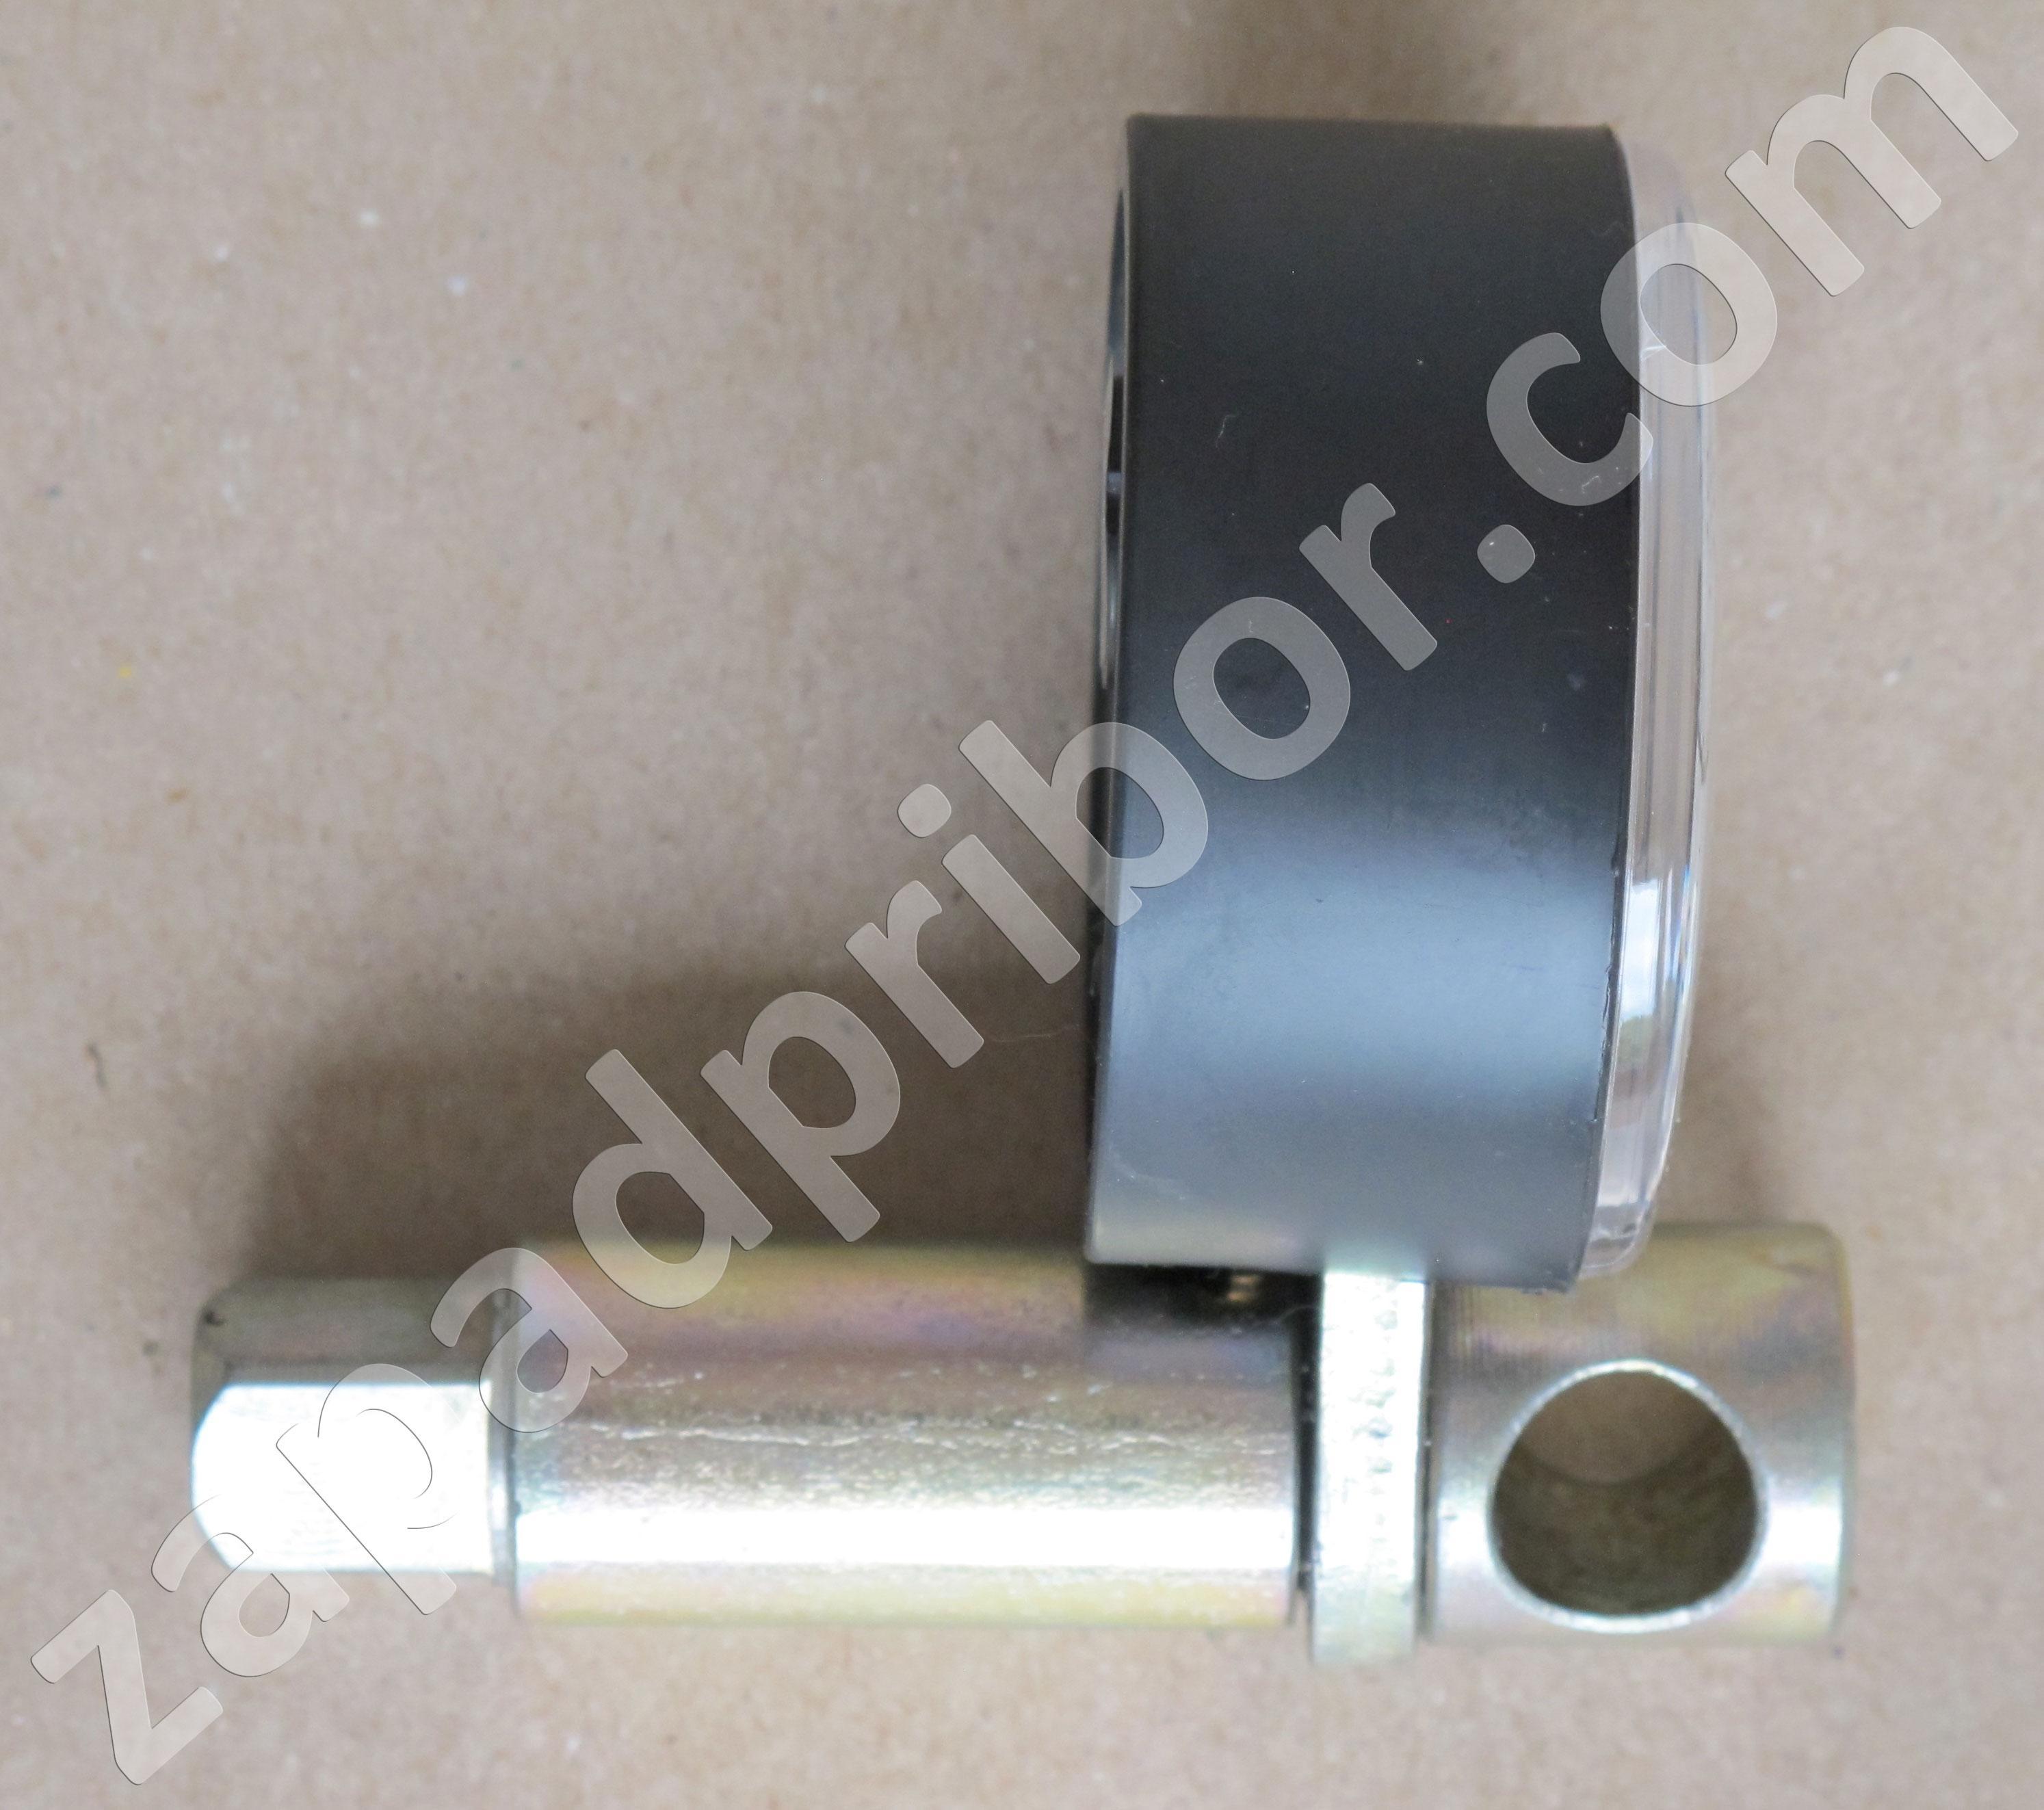 Ключ МТ-1-240 динамометрический, вид сбоку.